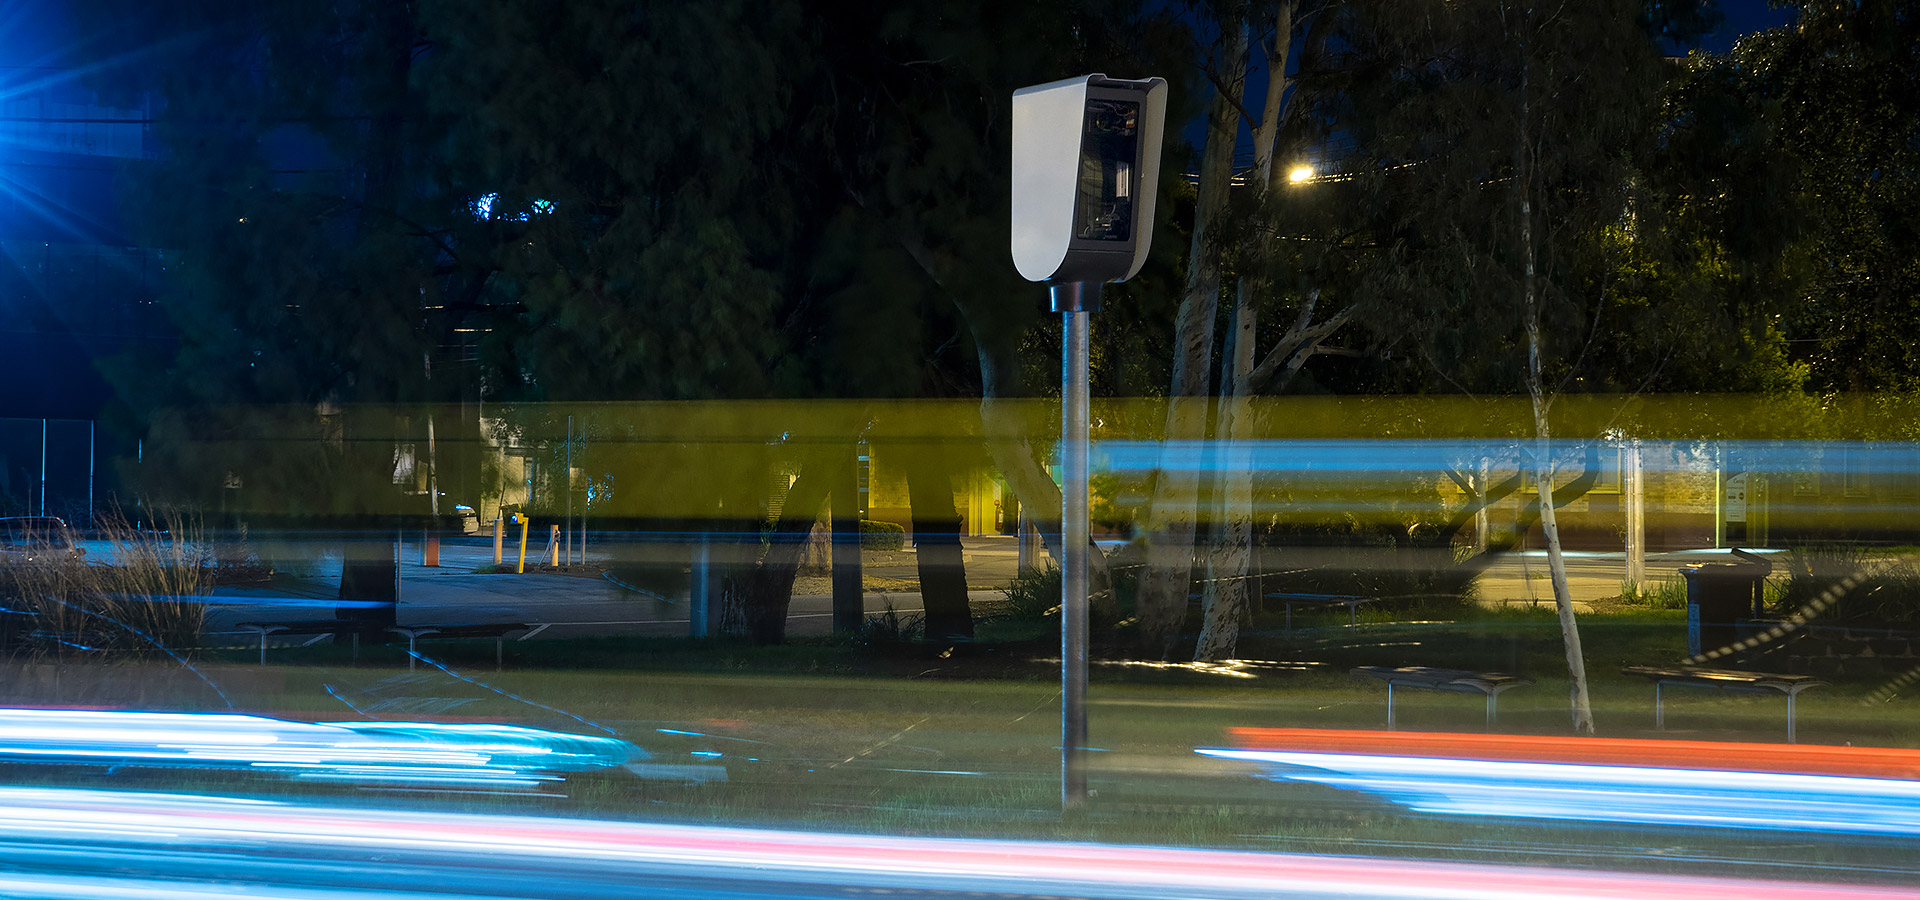 Redflex Halo Traffic Enforcement Camera